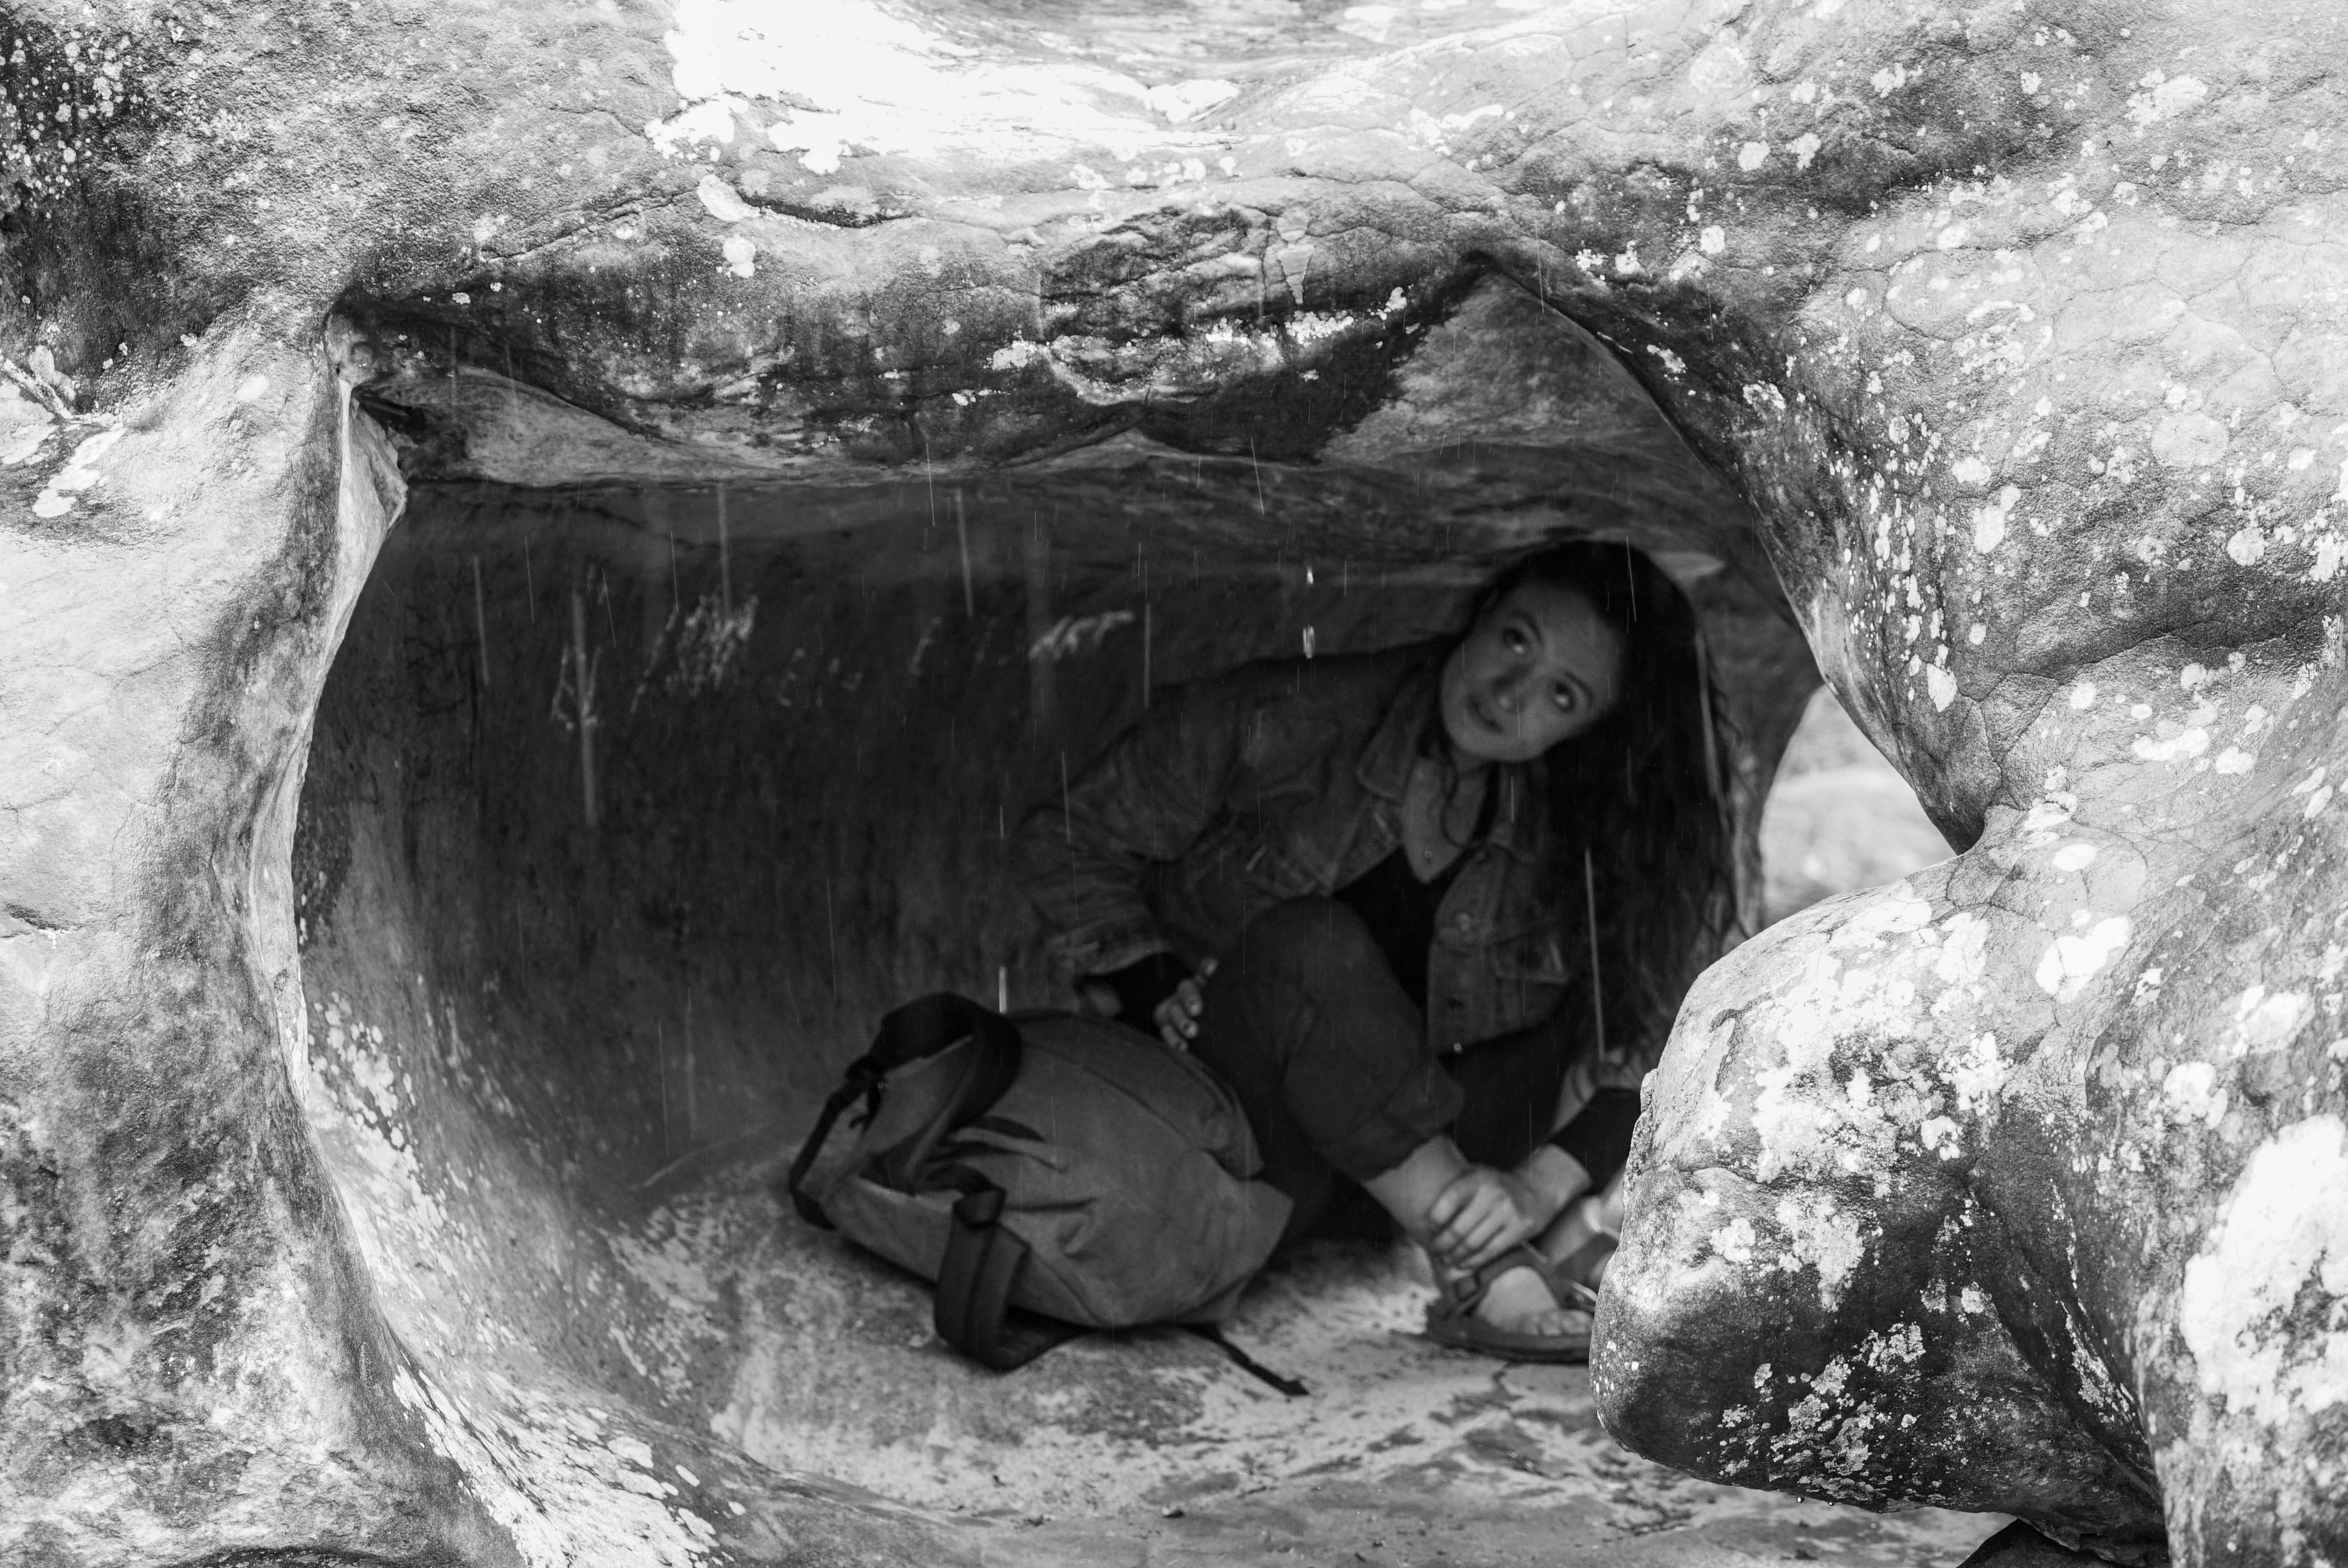 fontainbleau climbing 2016 mike brindley-21